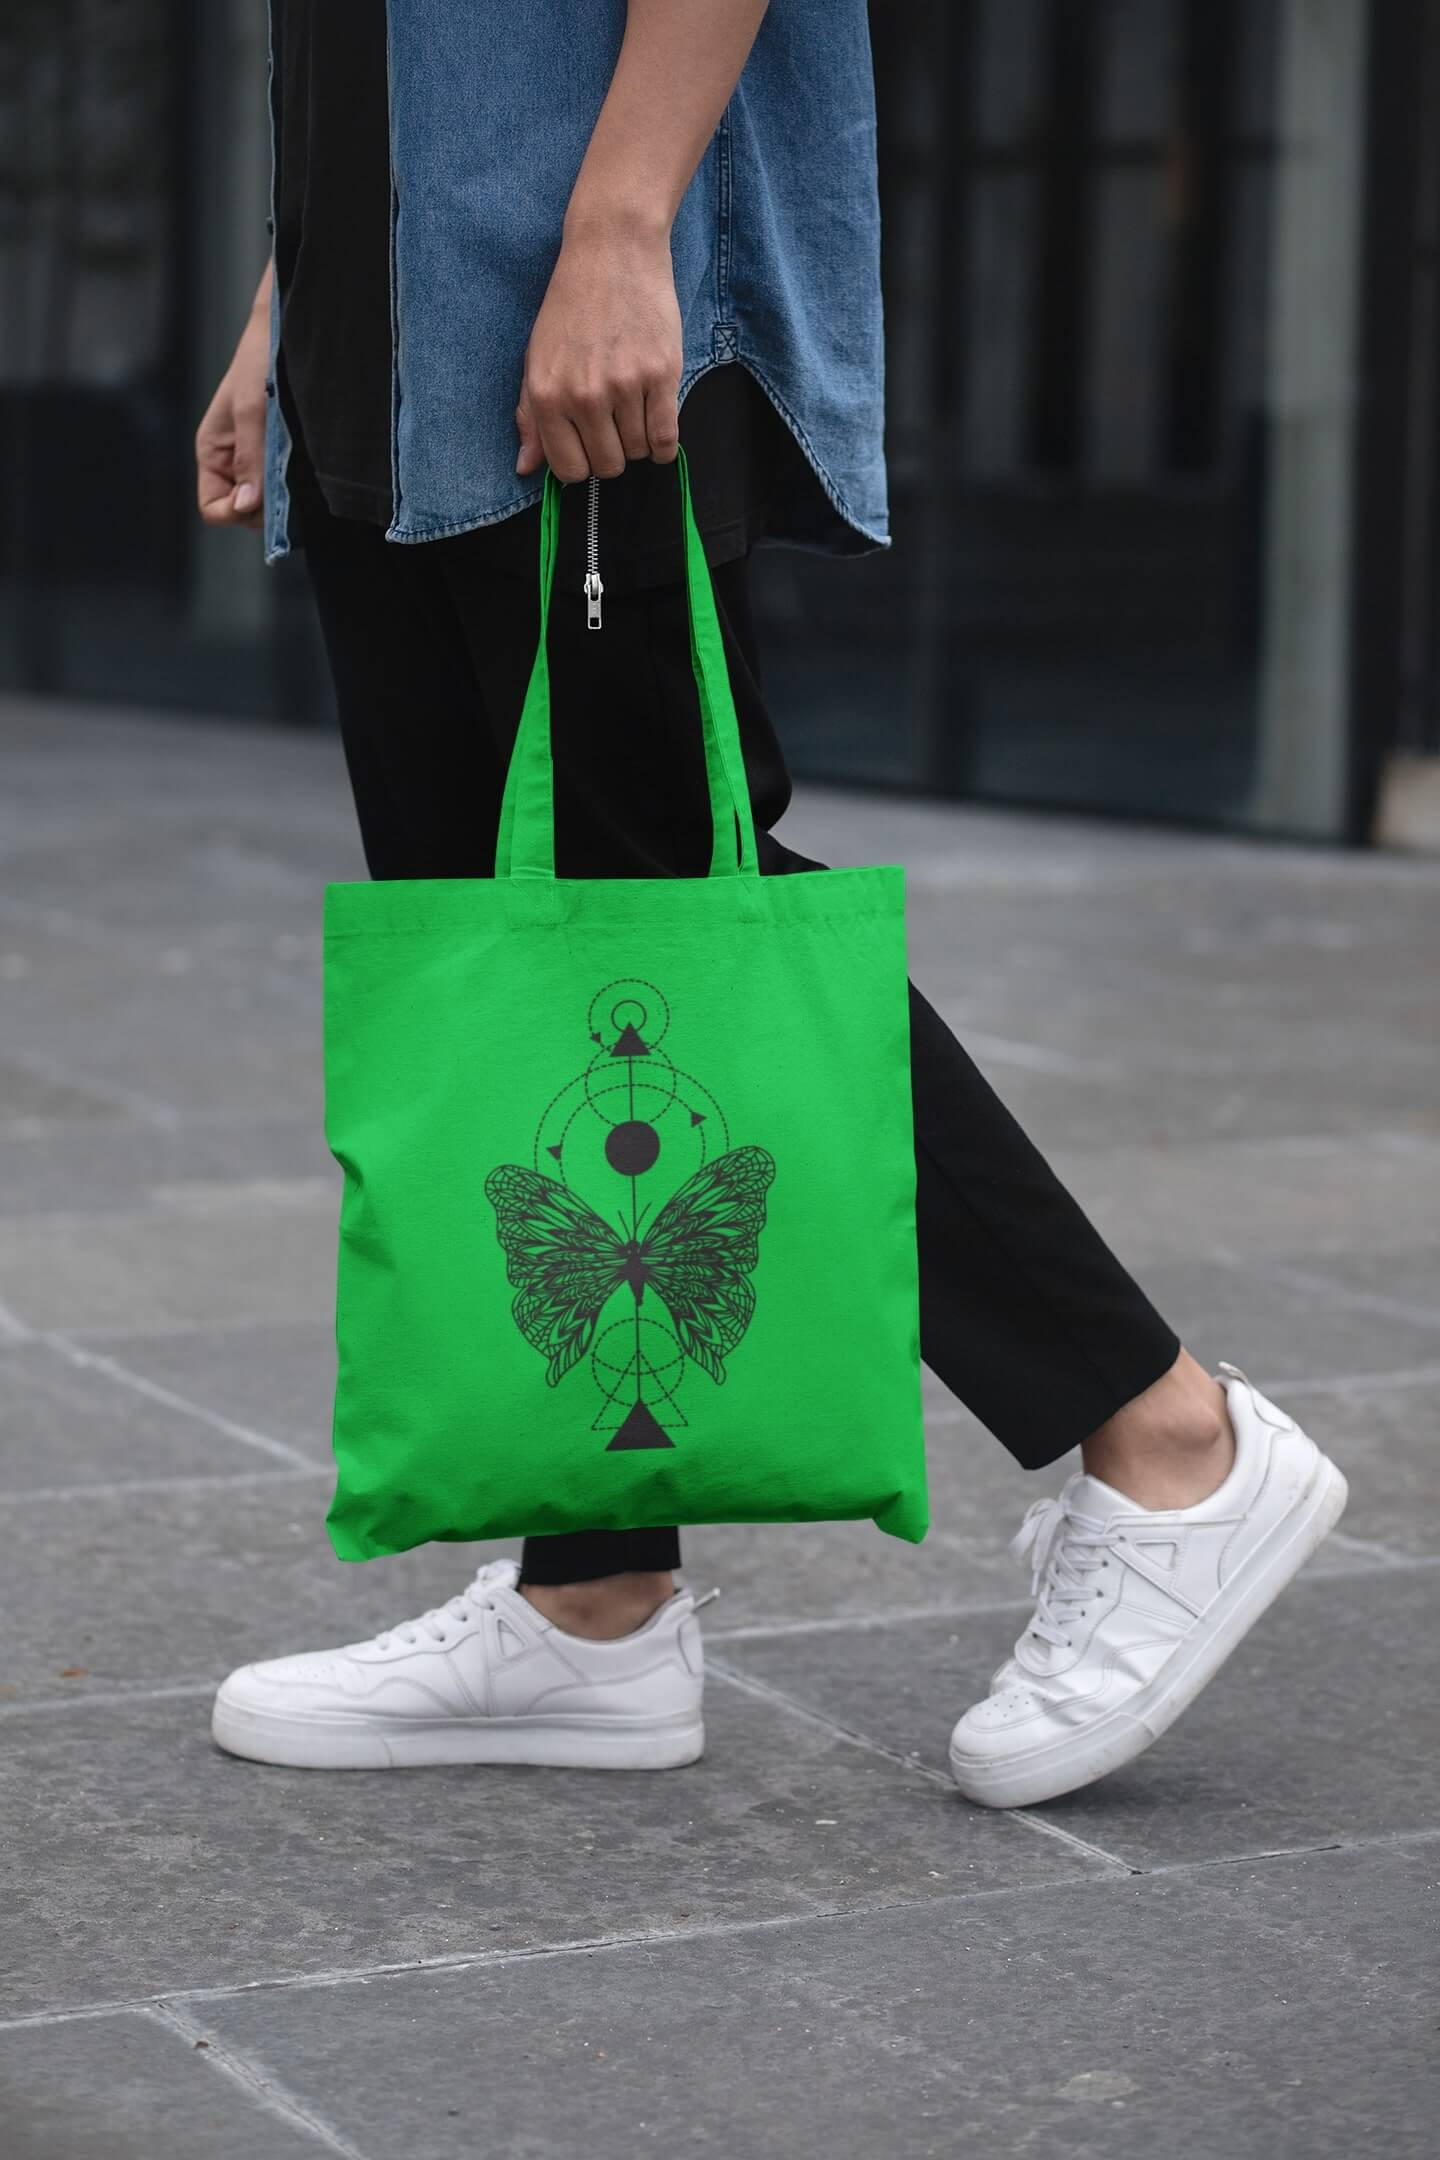 MMO Bavlnená taška Motýľ Farba tašky: Jablková